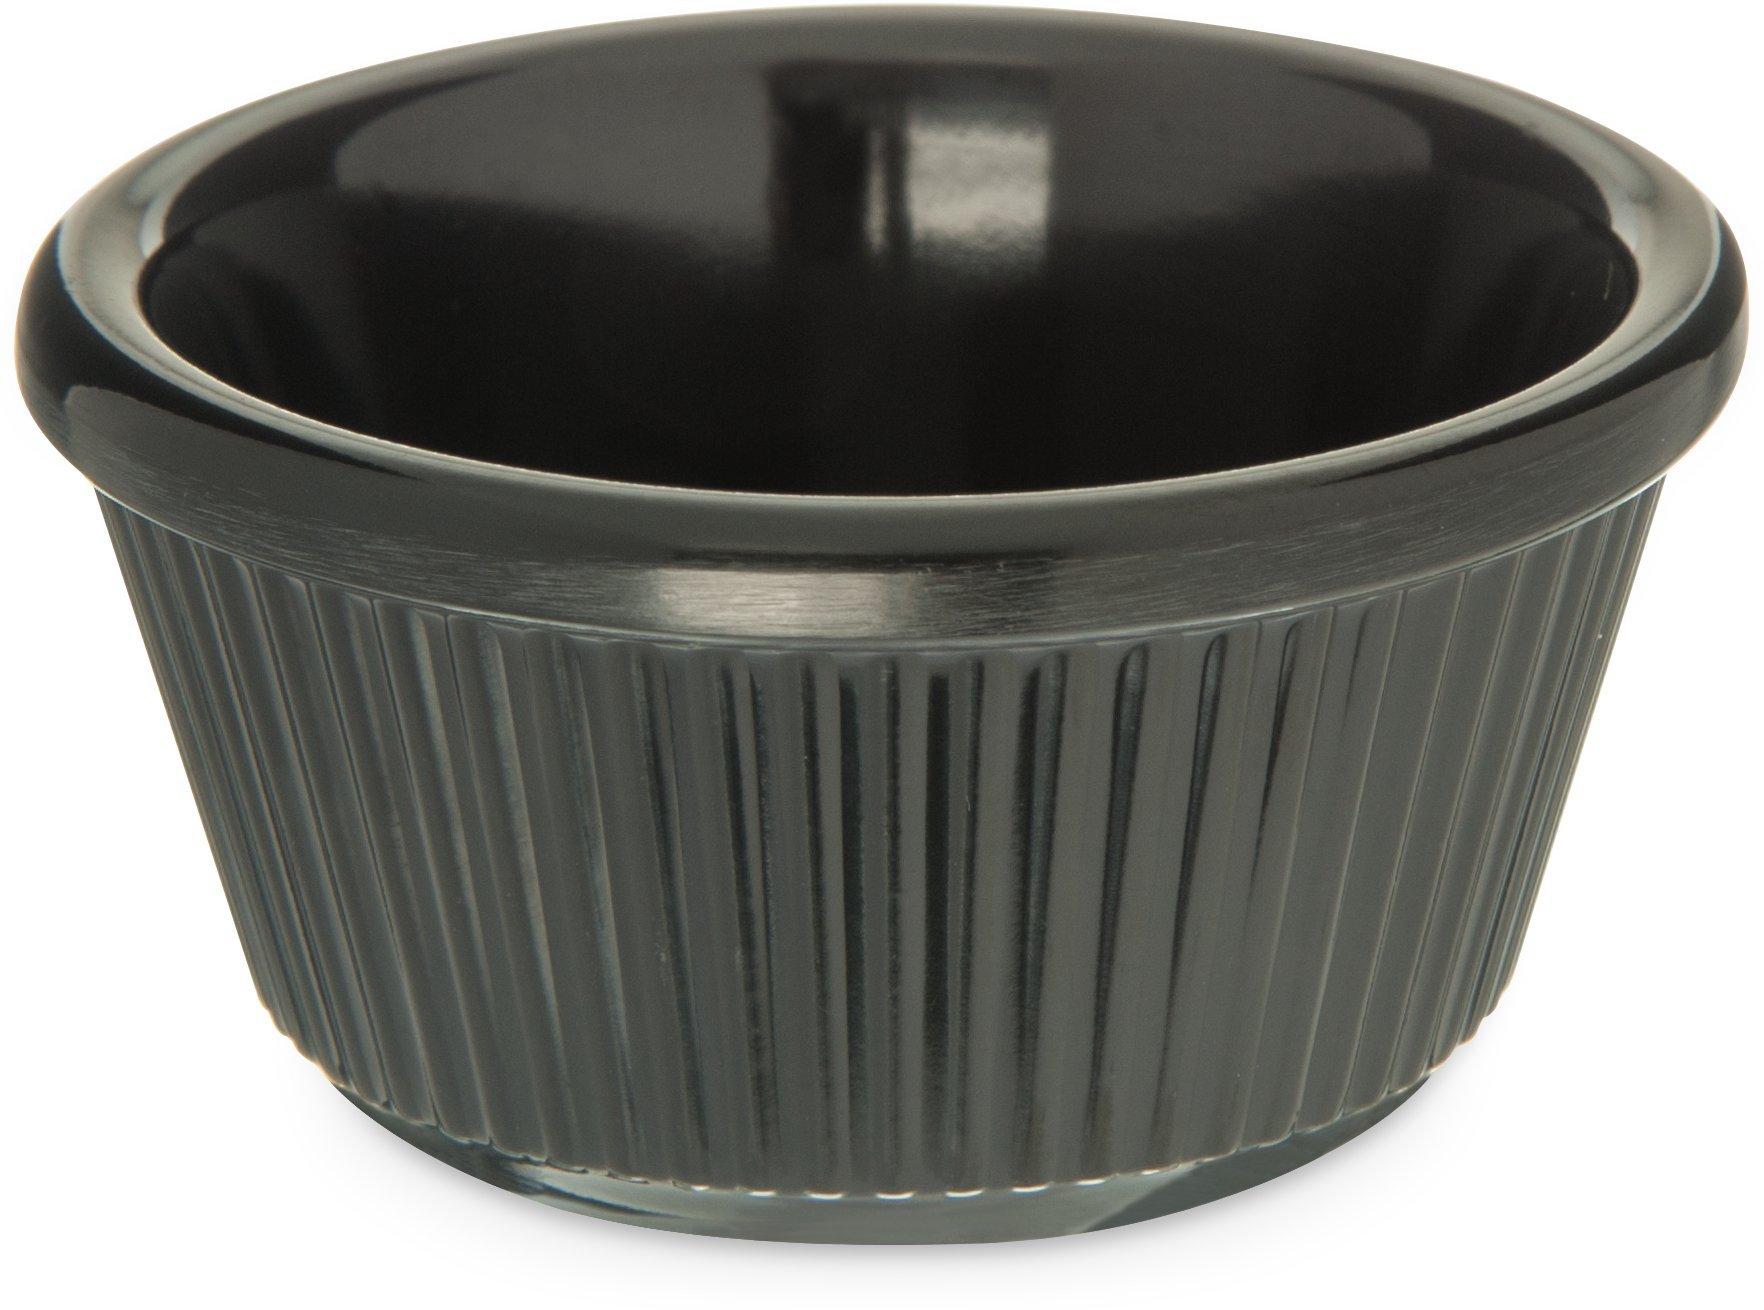 Carlisle S28203 Melamine Fluted Ramekin, 3 oz. Capacity, Black (Case of 48)